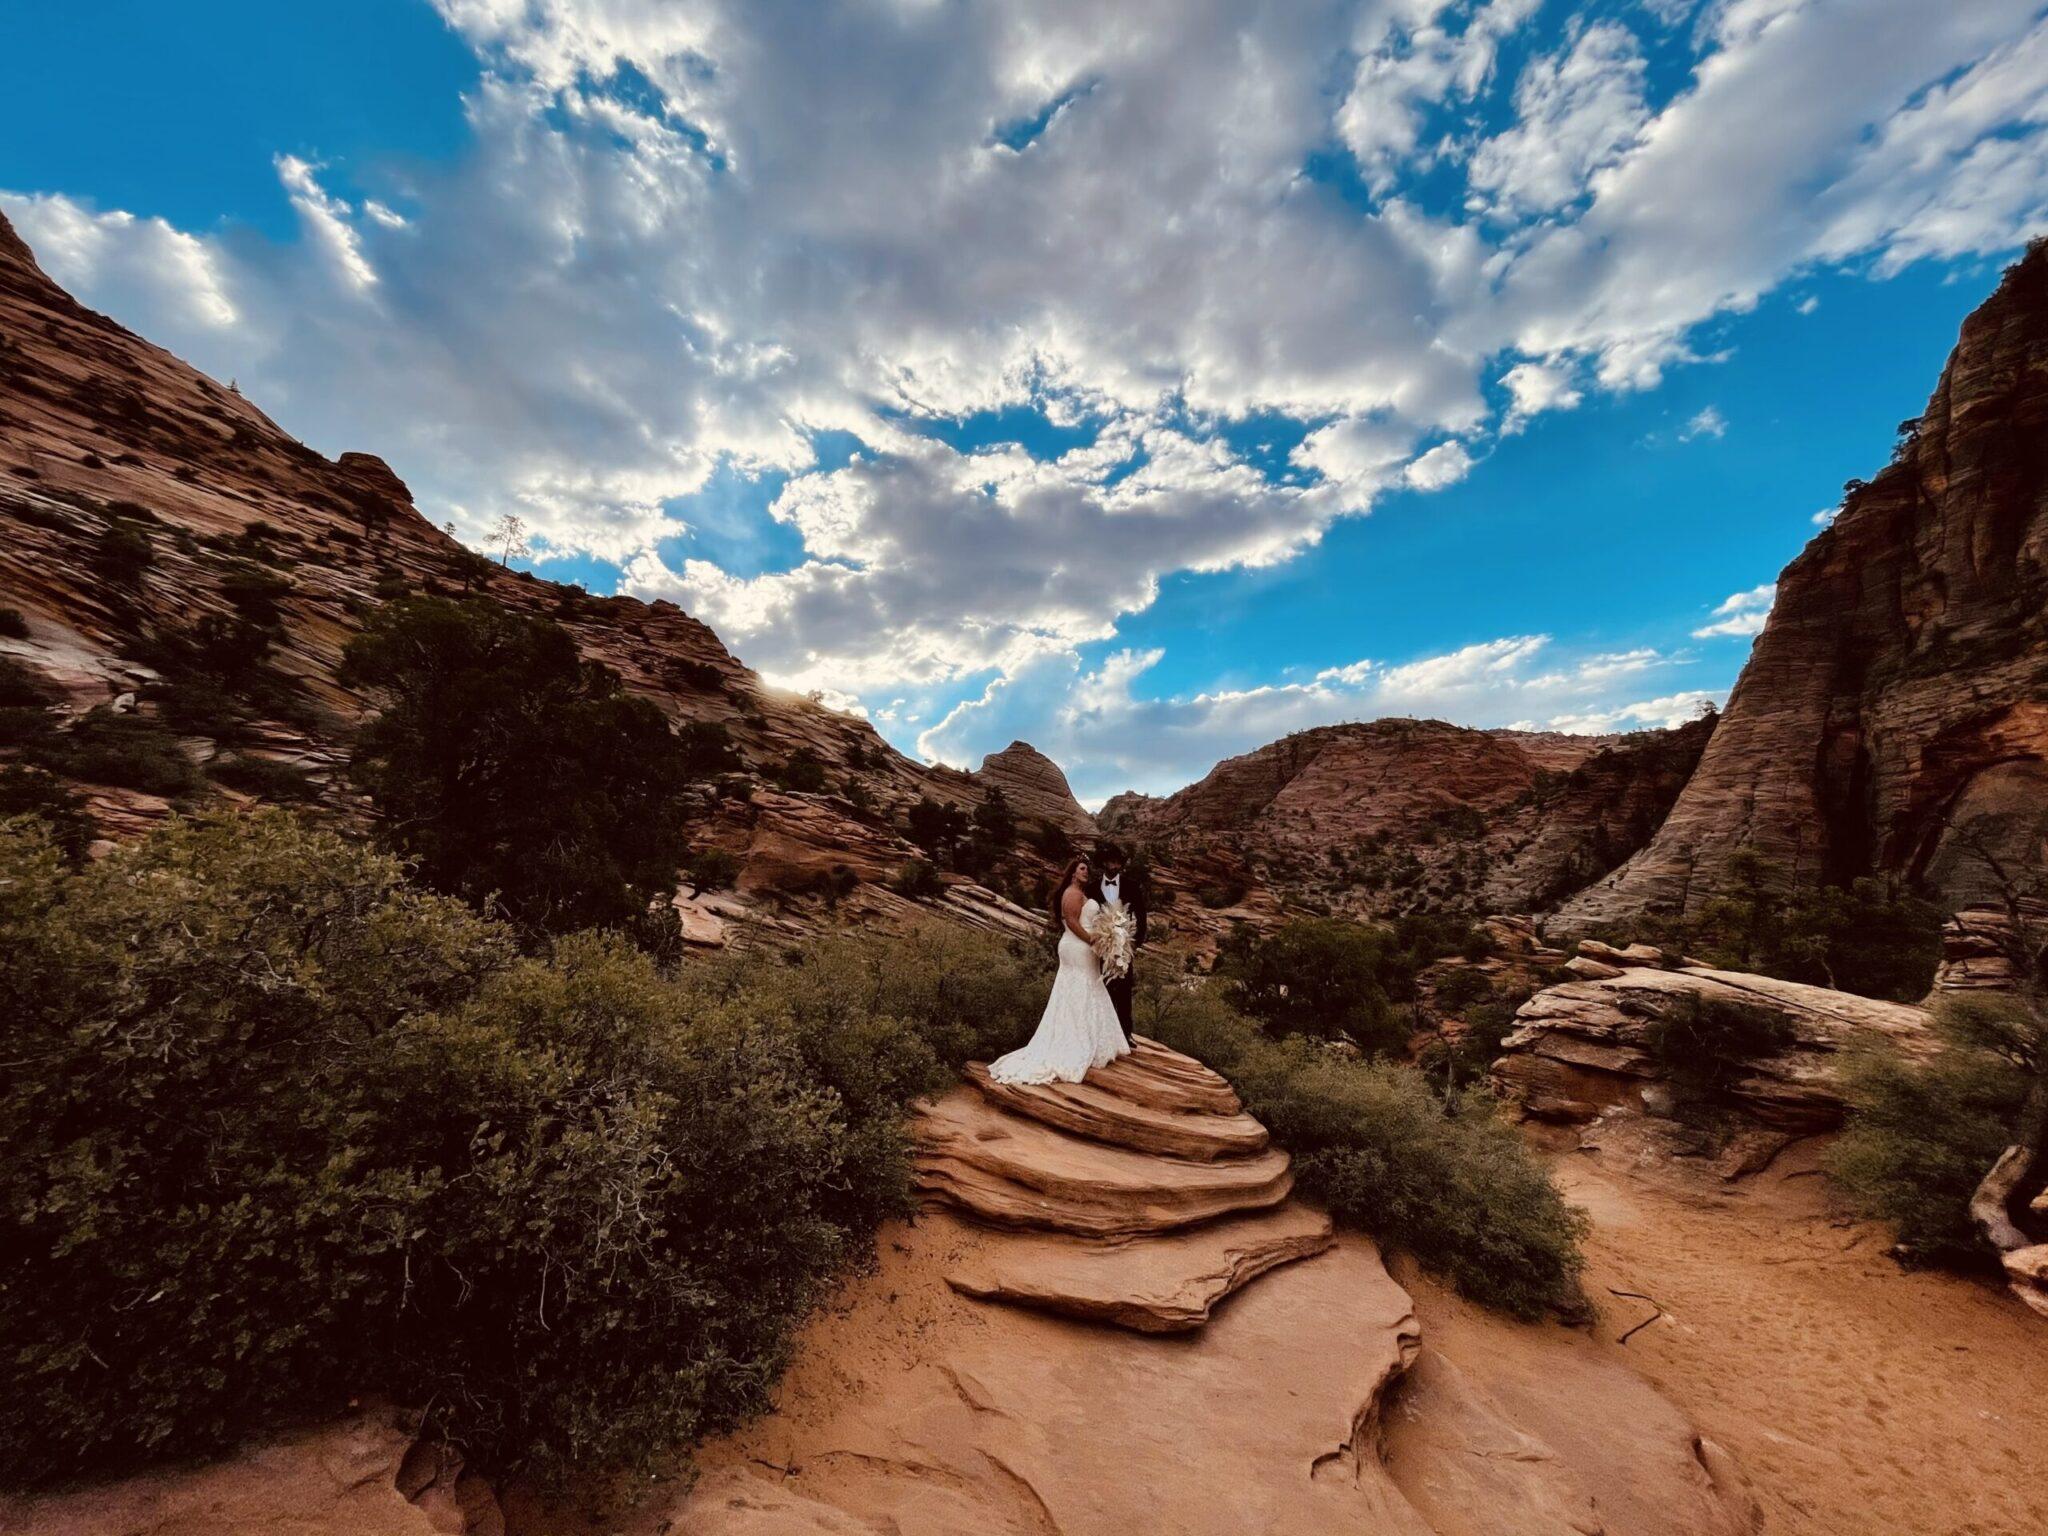 Zion national Park Wedding Photography   Ashae + Austin